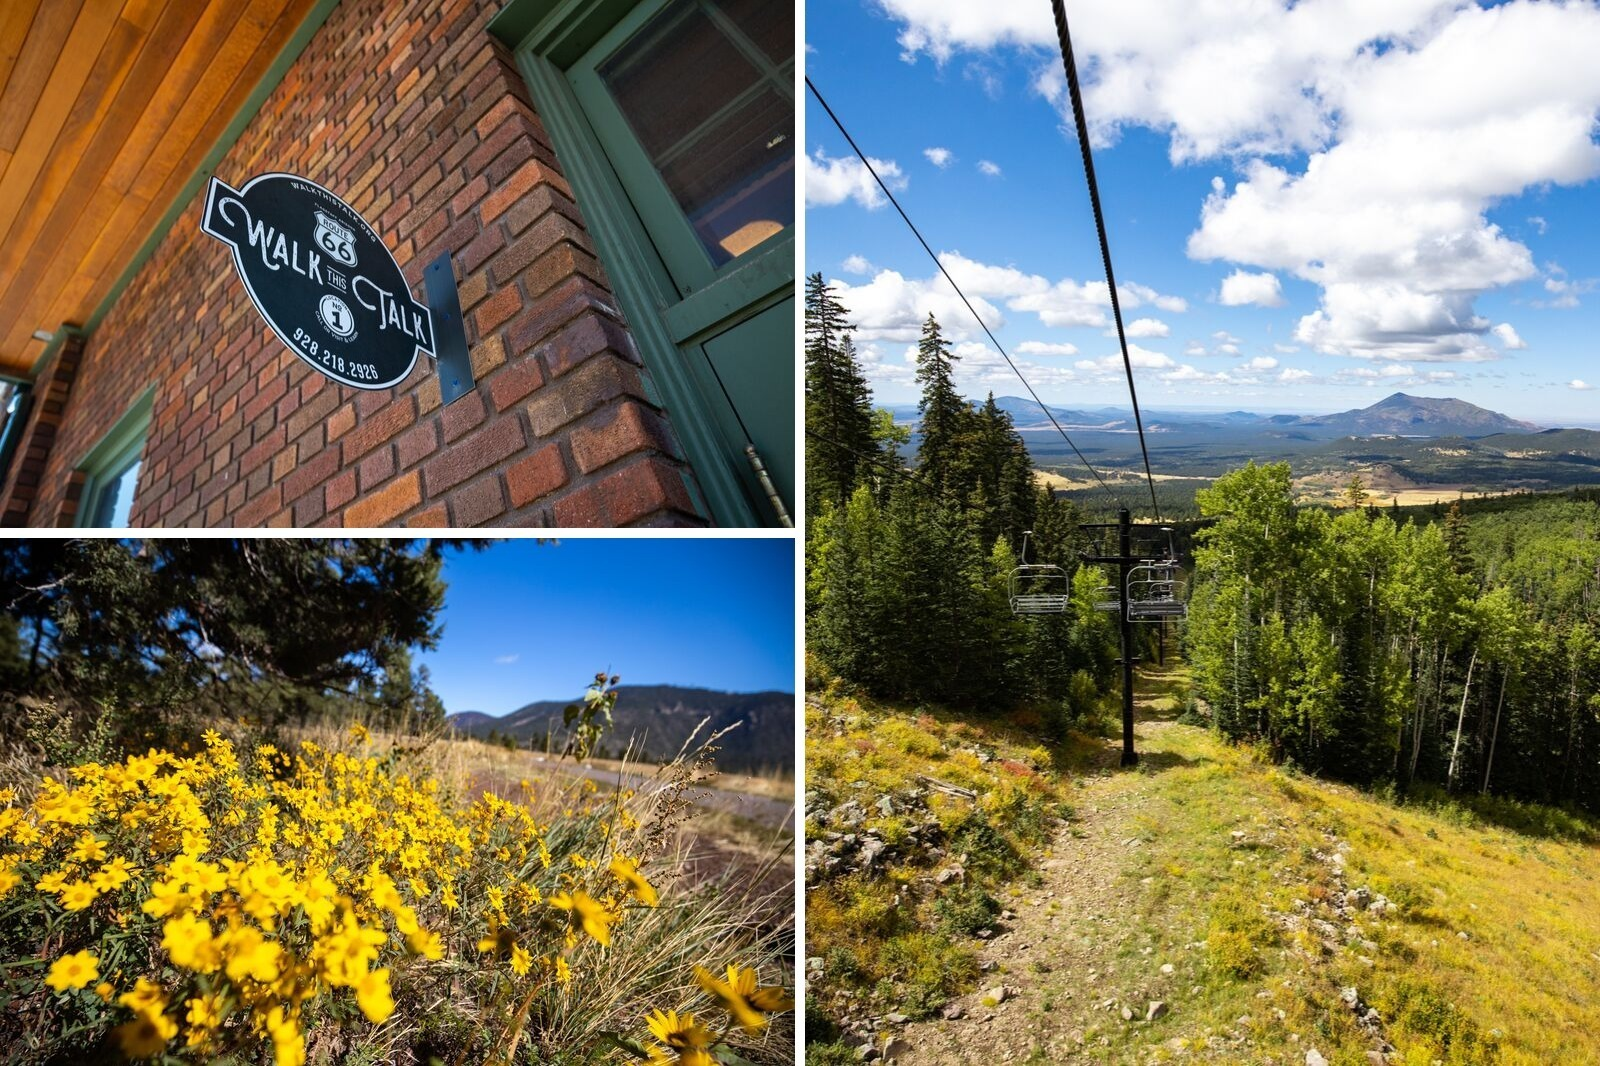 Flagstaff, Arizona is a Four Seasons Destination